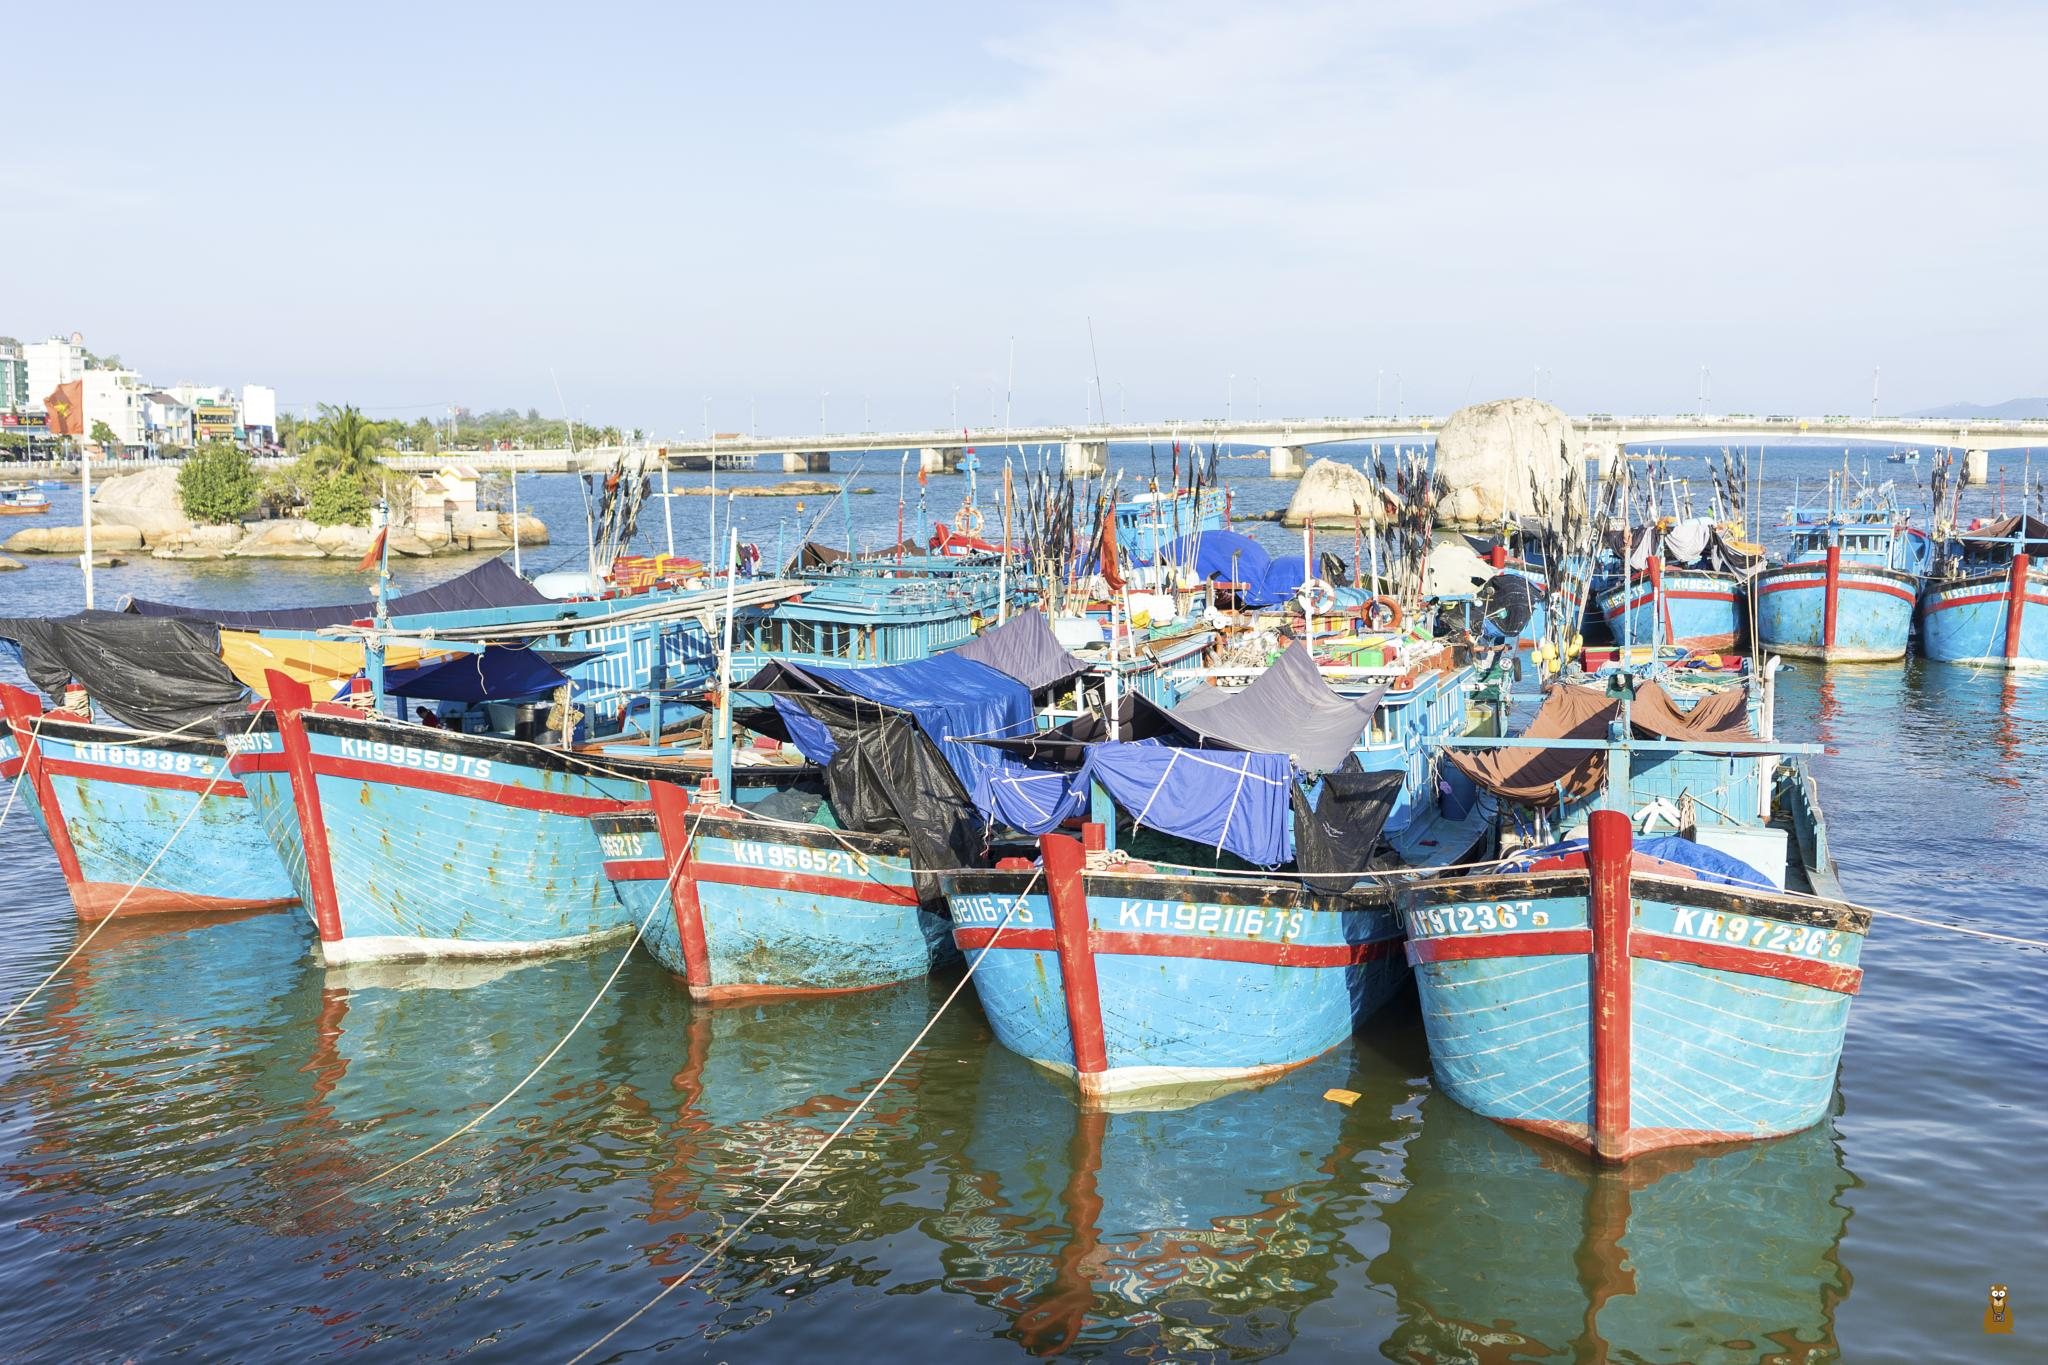 Boats by Dung Tuan Pham